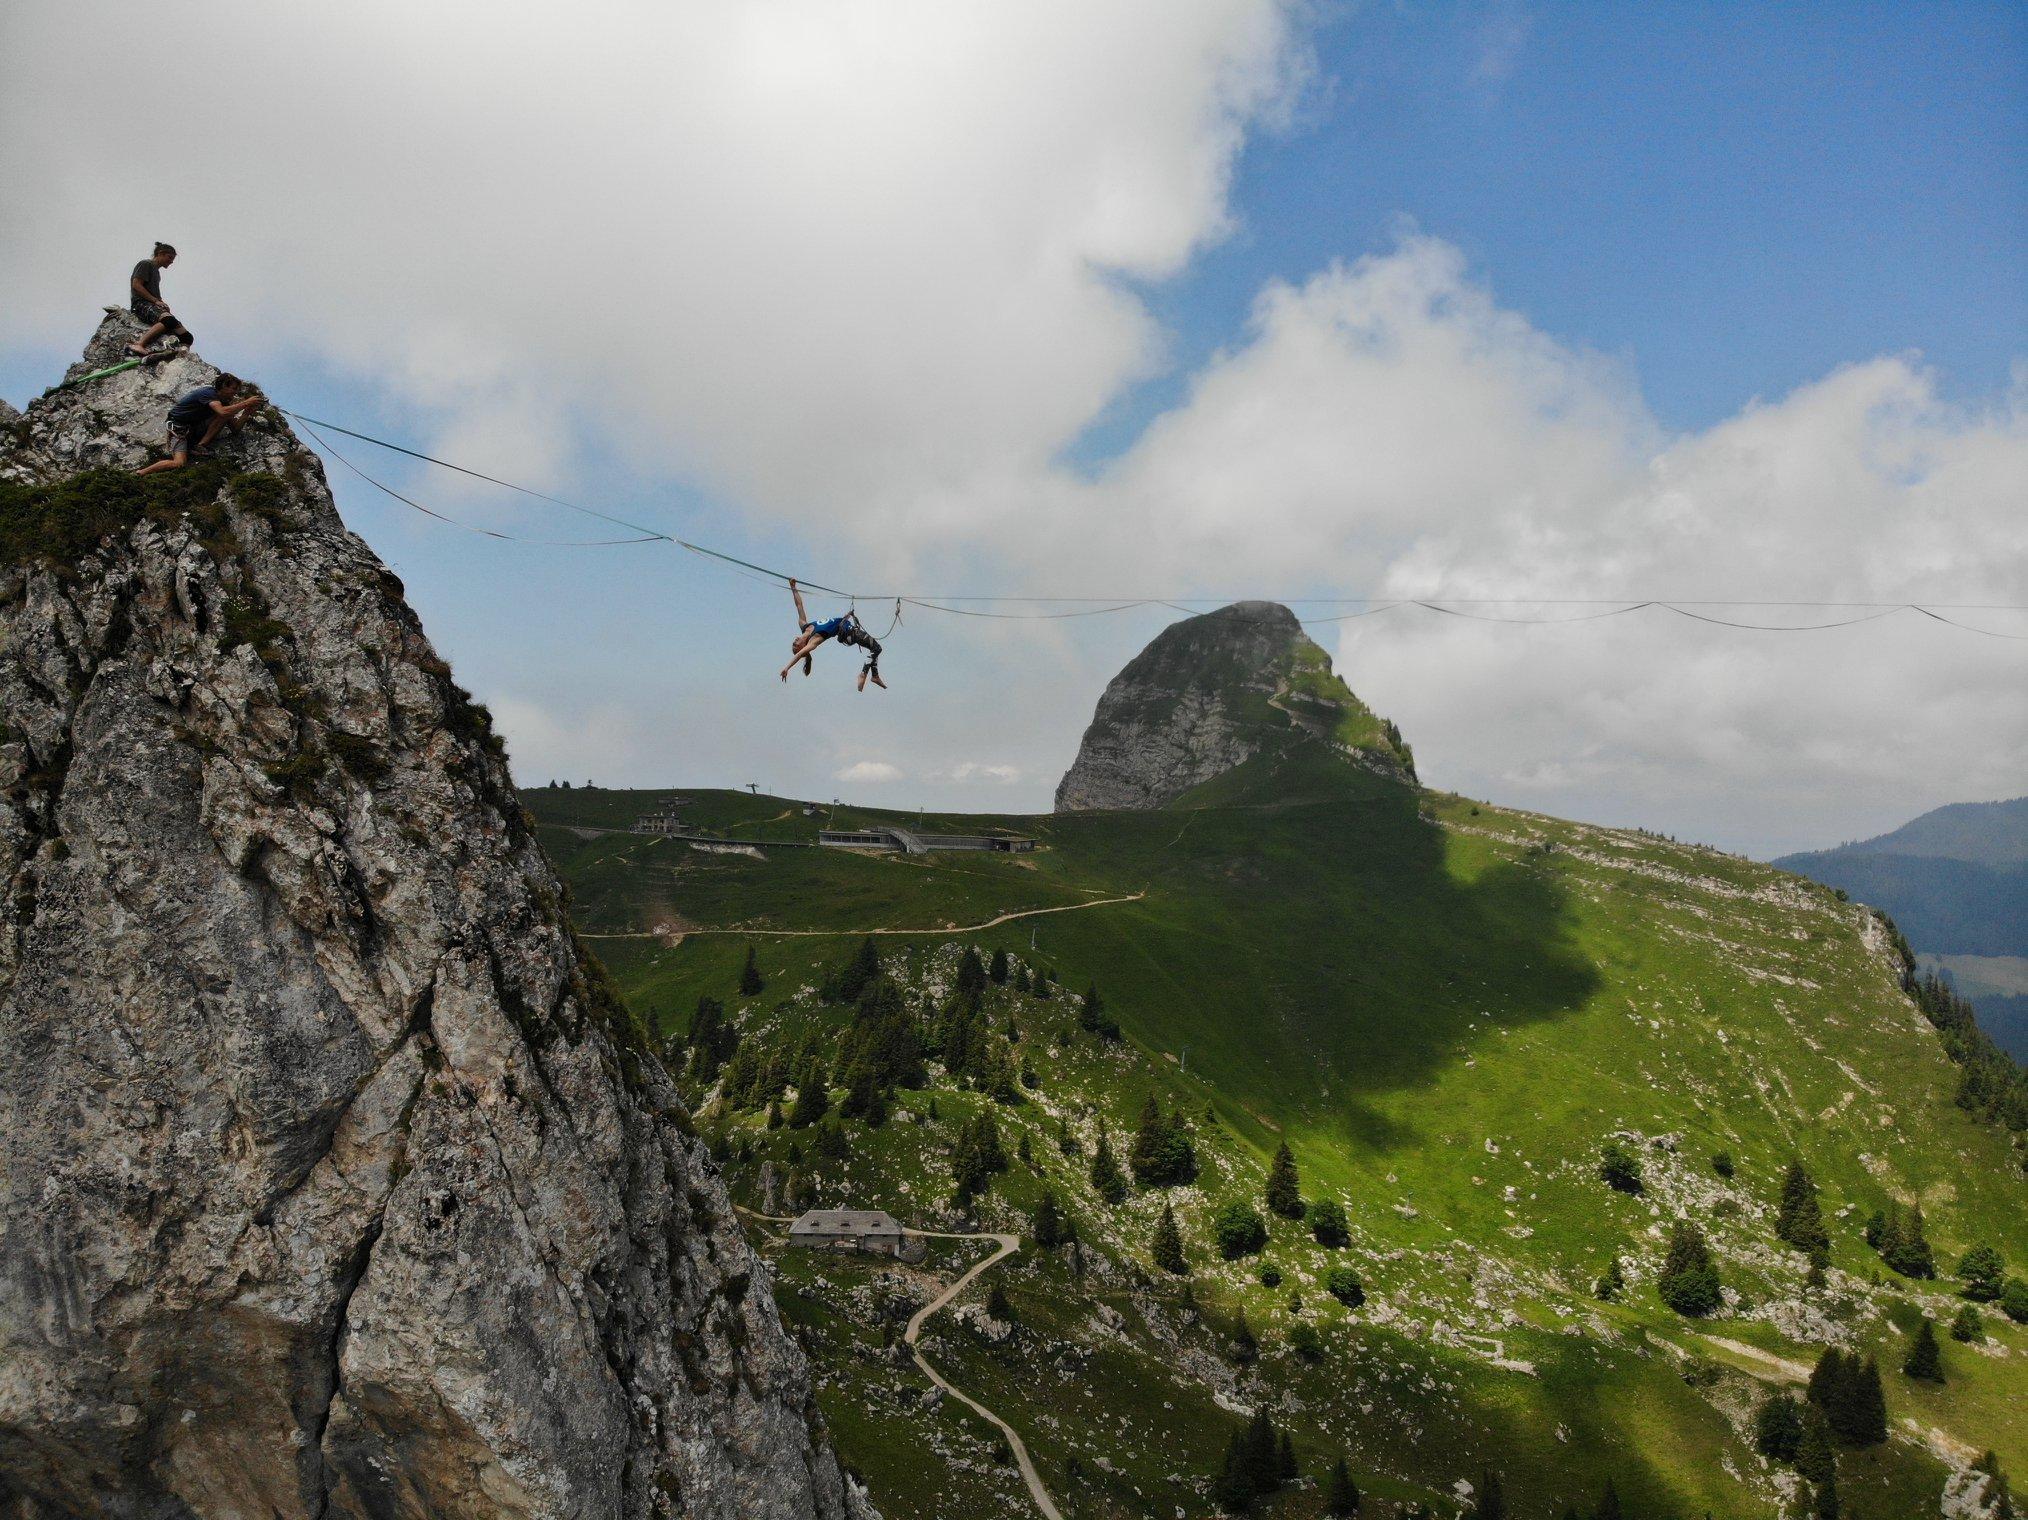 montagne Jaman moutain extreme highline trickline show funambule circus performance spectacle ecole suisse Slackline Lyell Grunberg  (3).jpg